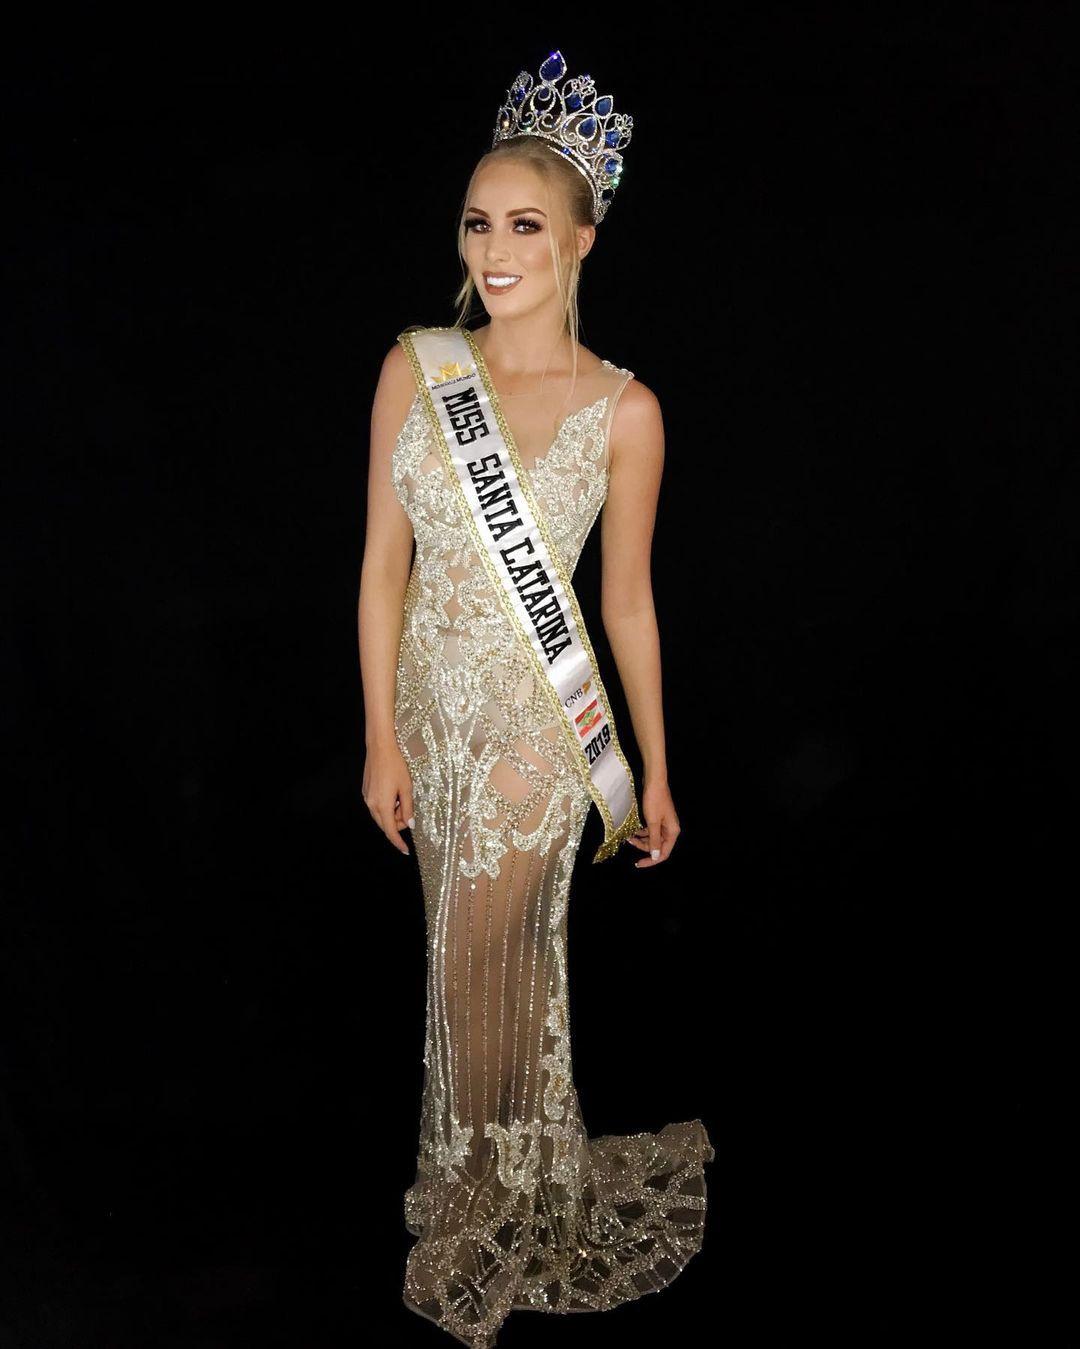 elizama aguilar, top 5 de miss brasil mundo 2019. - Página 2 Bdjvob10